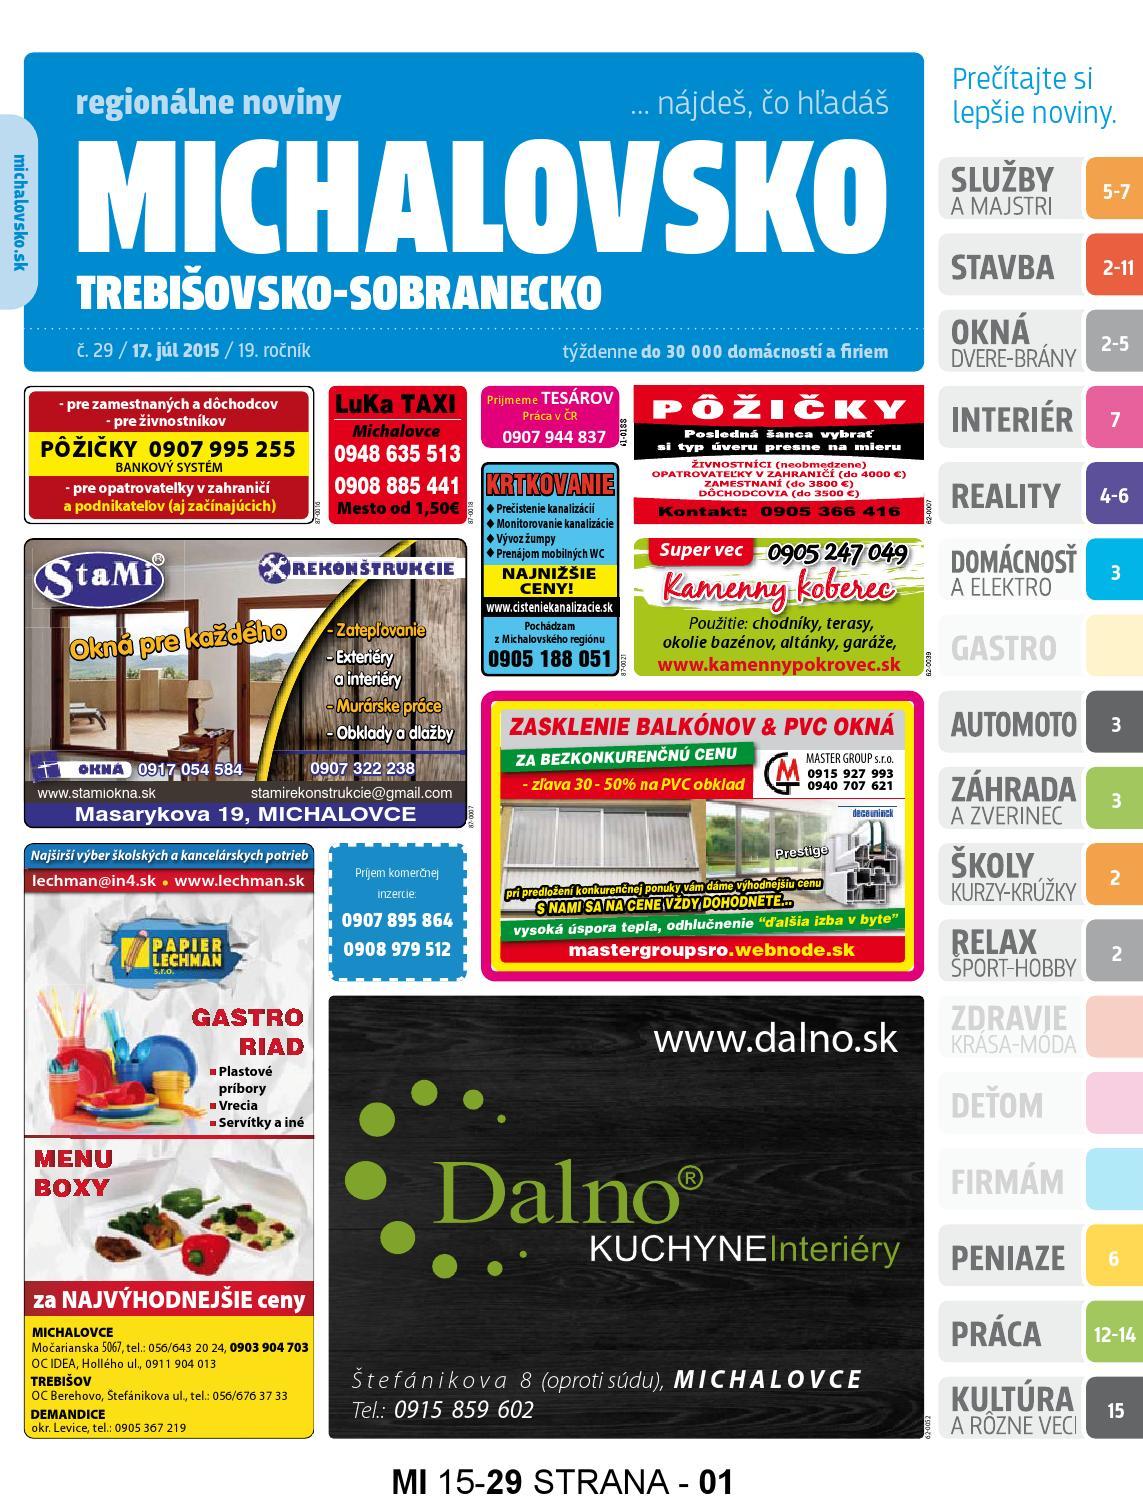 zadarmo datovania webové stránky na Ukrajine